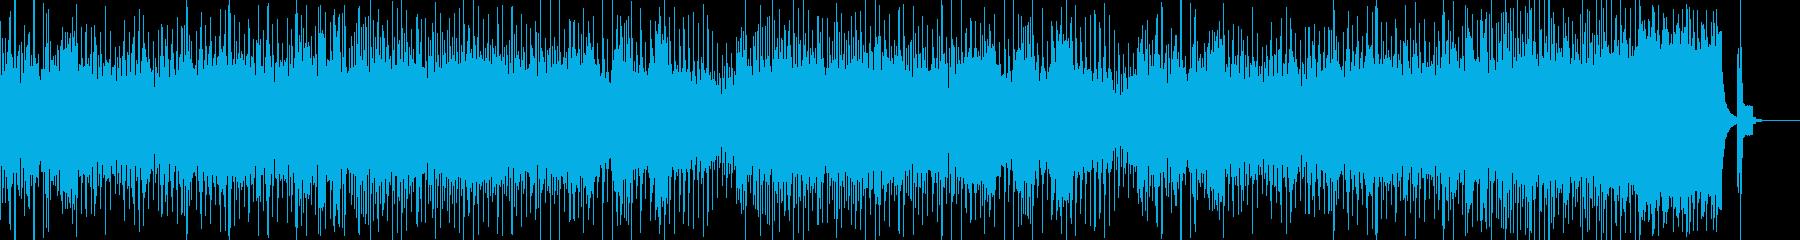 8bitクラシック「熱情」「悲愴」の再生済みの波形